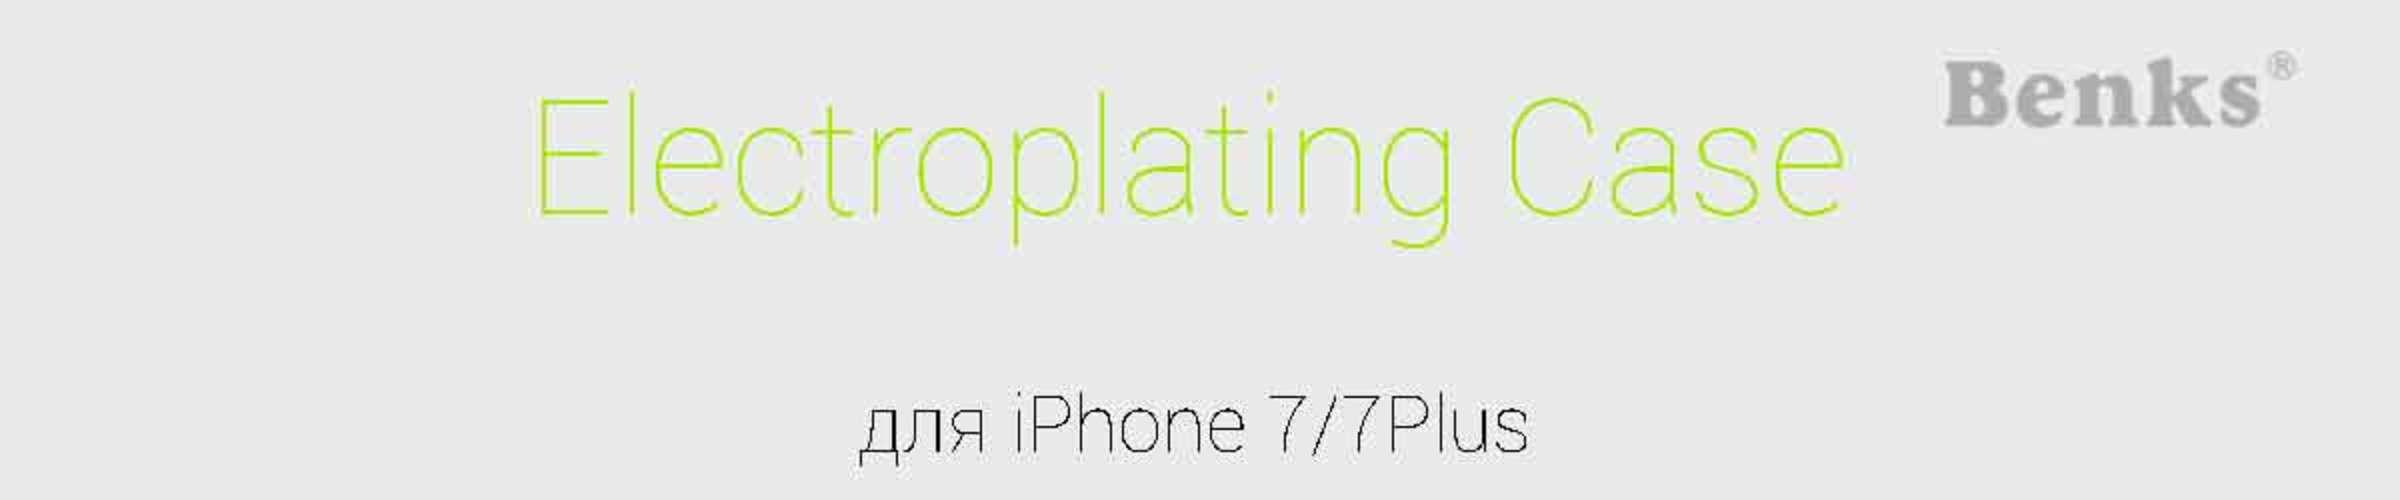 Обзор чехла на iPhone 7/8 от компании Benks. Серия Electroplati